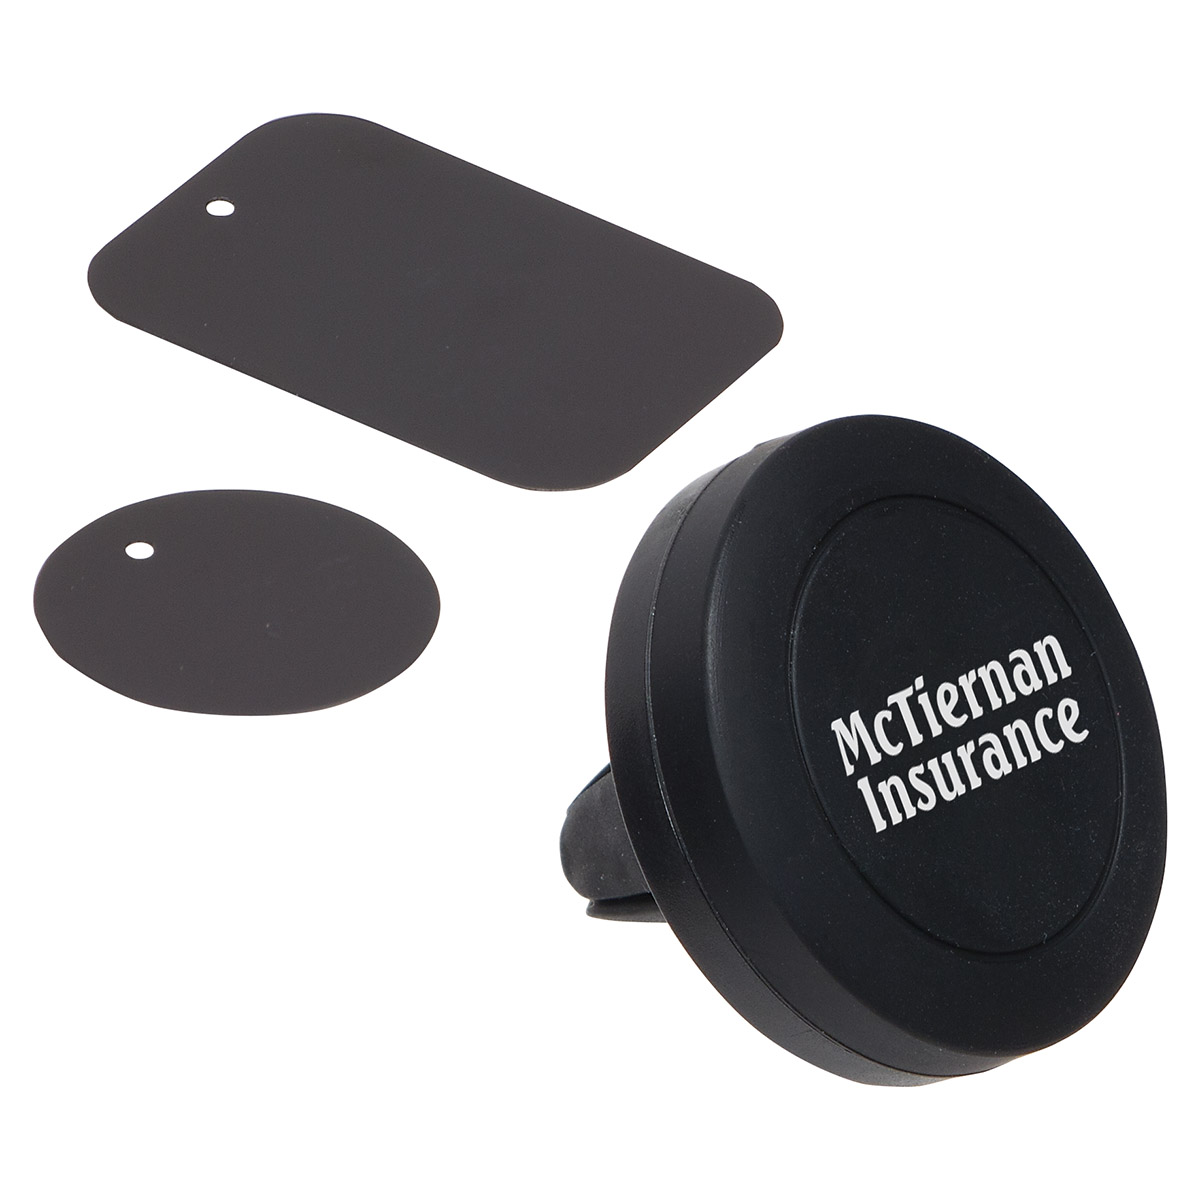 Magna Grip Vent Clip & Phone Stand, WAU-MV17, 1 Colour Imprint